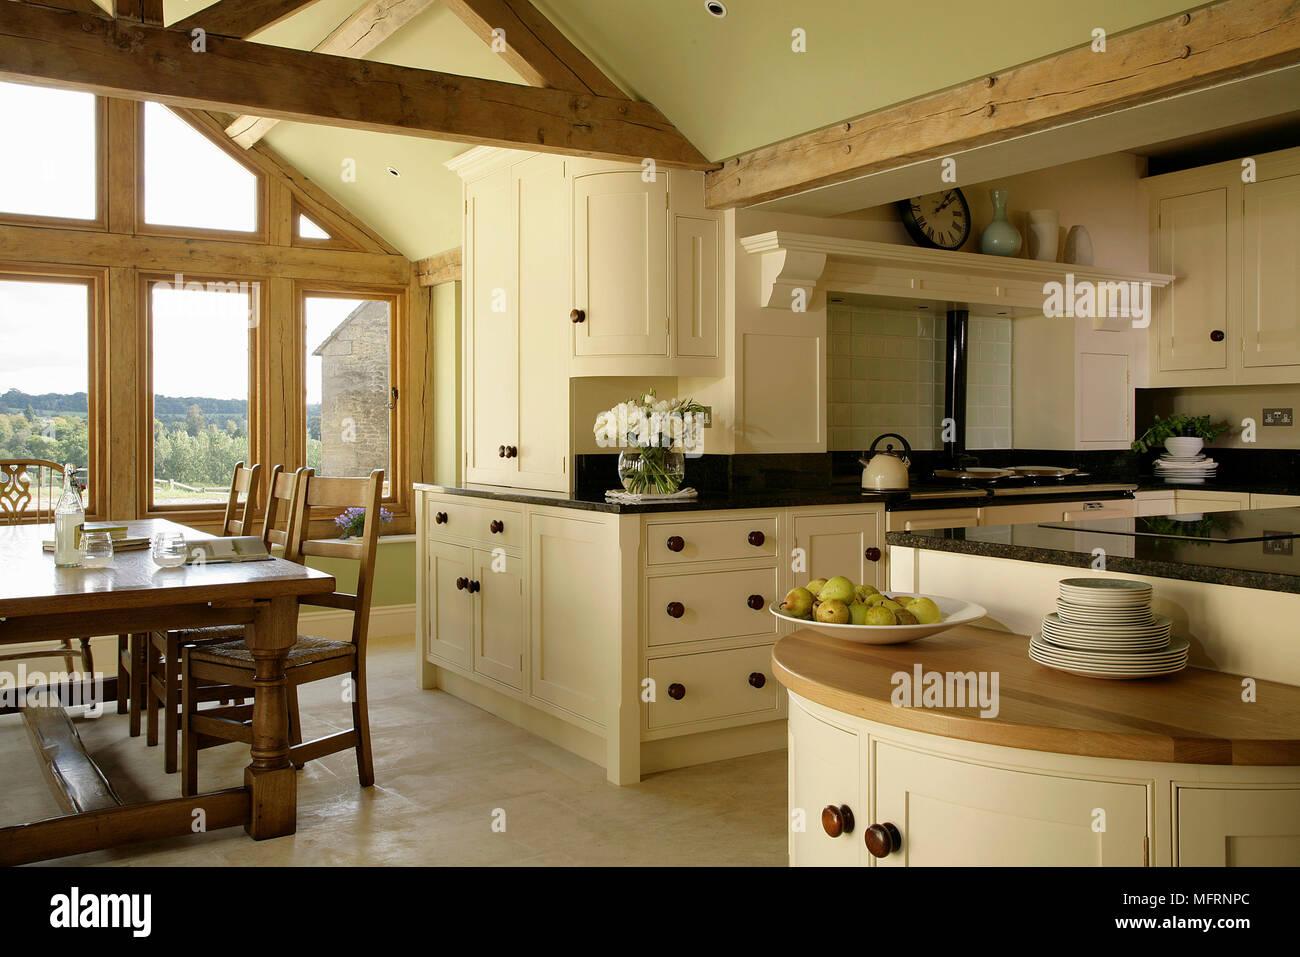 Racconto da pranzo e sedie in moderno stile country cucina ...